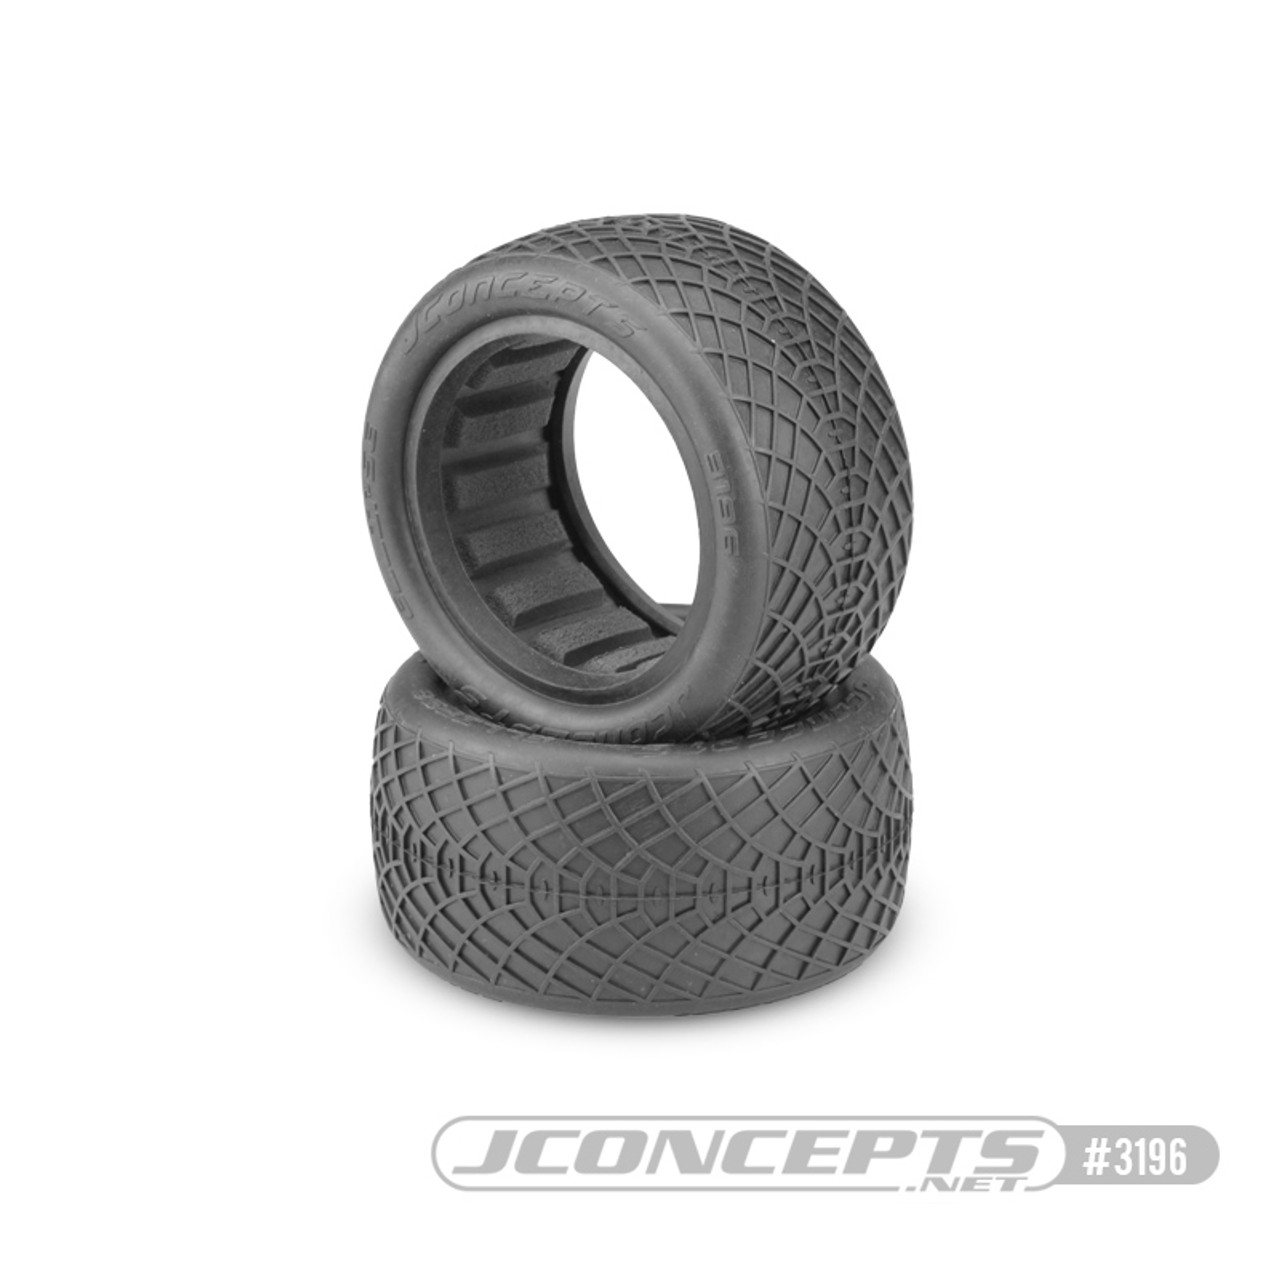 2 JConcepts Ellipse 1//8th Buggy Tires Gold